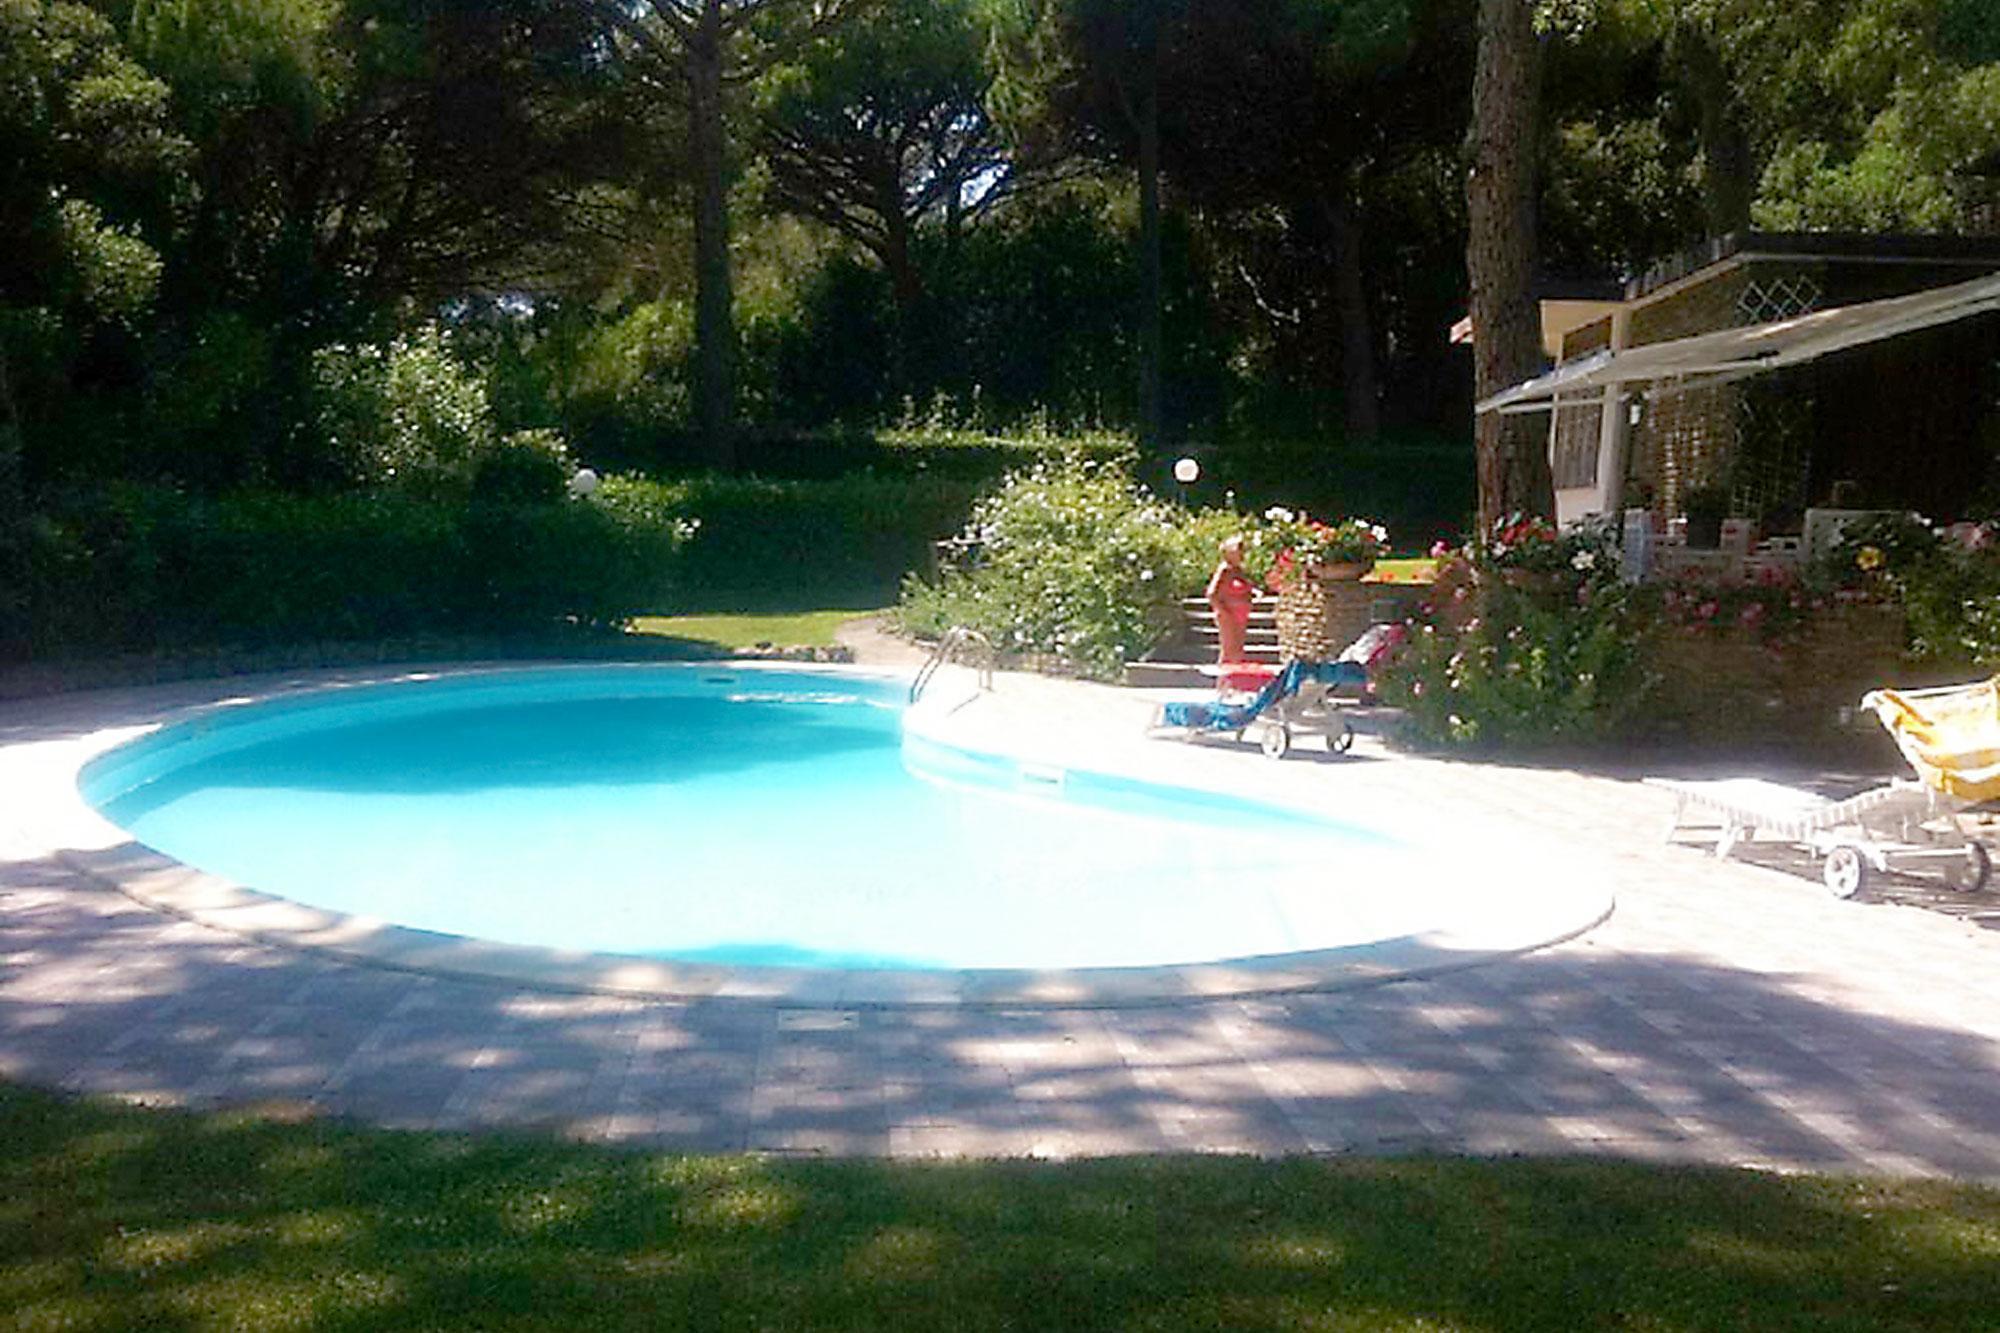 Punta Ala   Splendid Villa With Pool And Garden